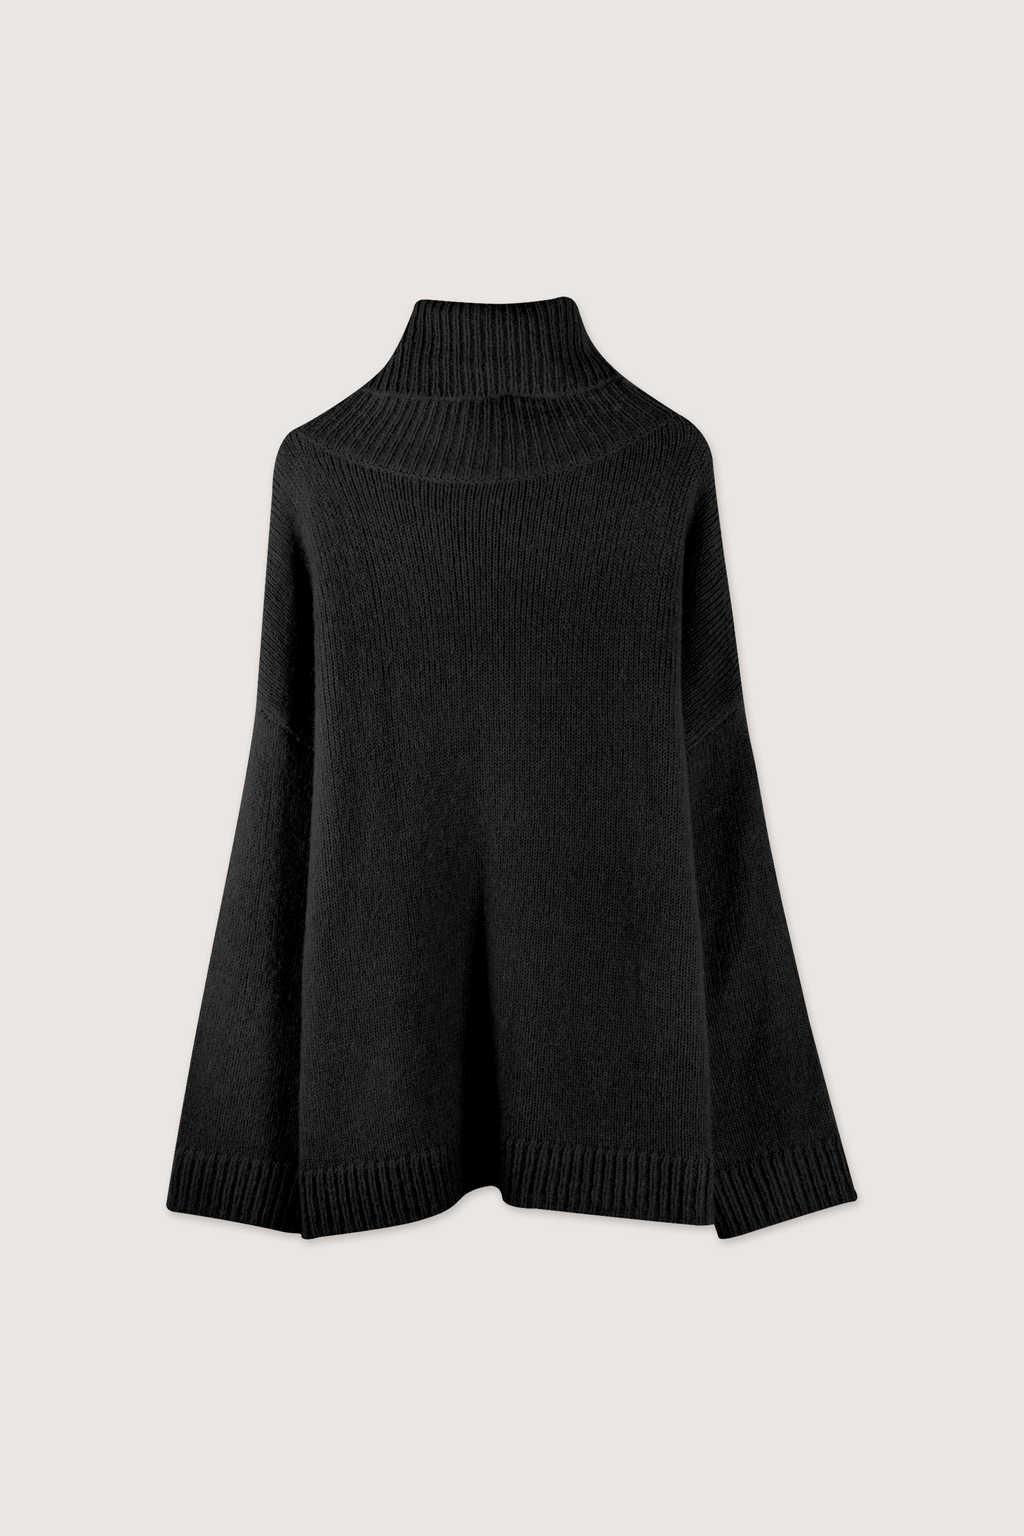 Sweater 1782 Black 7